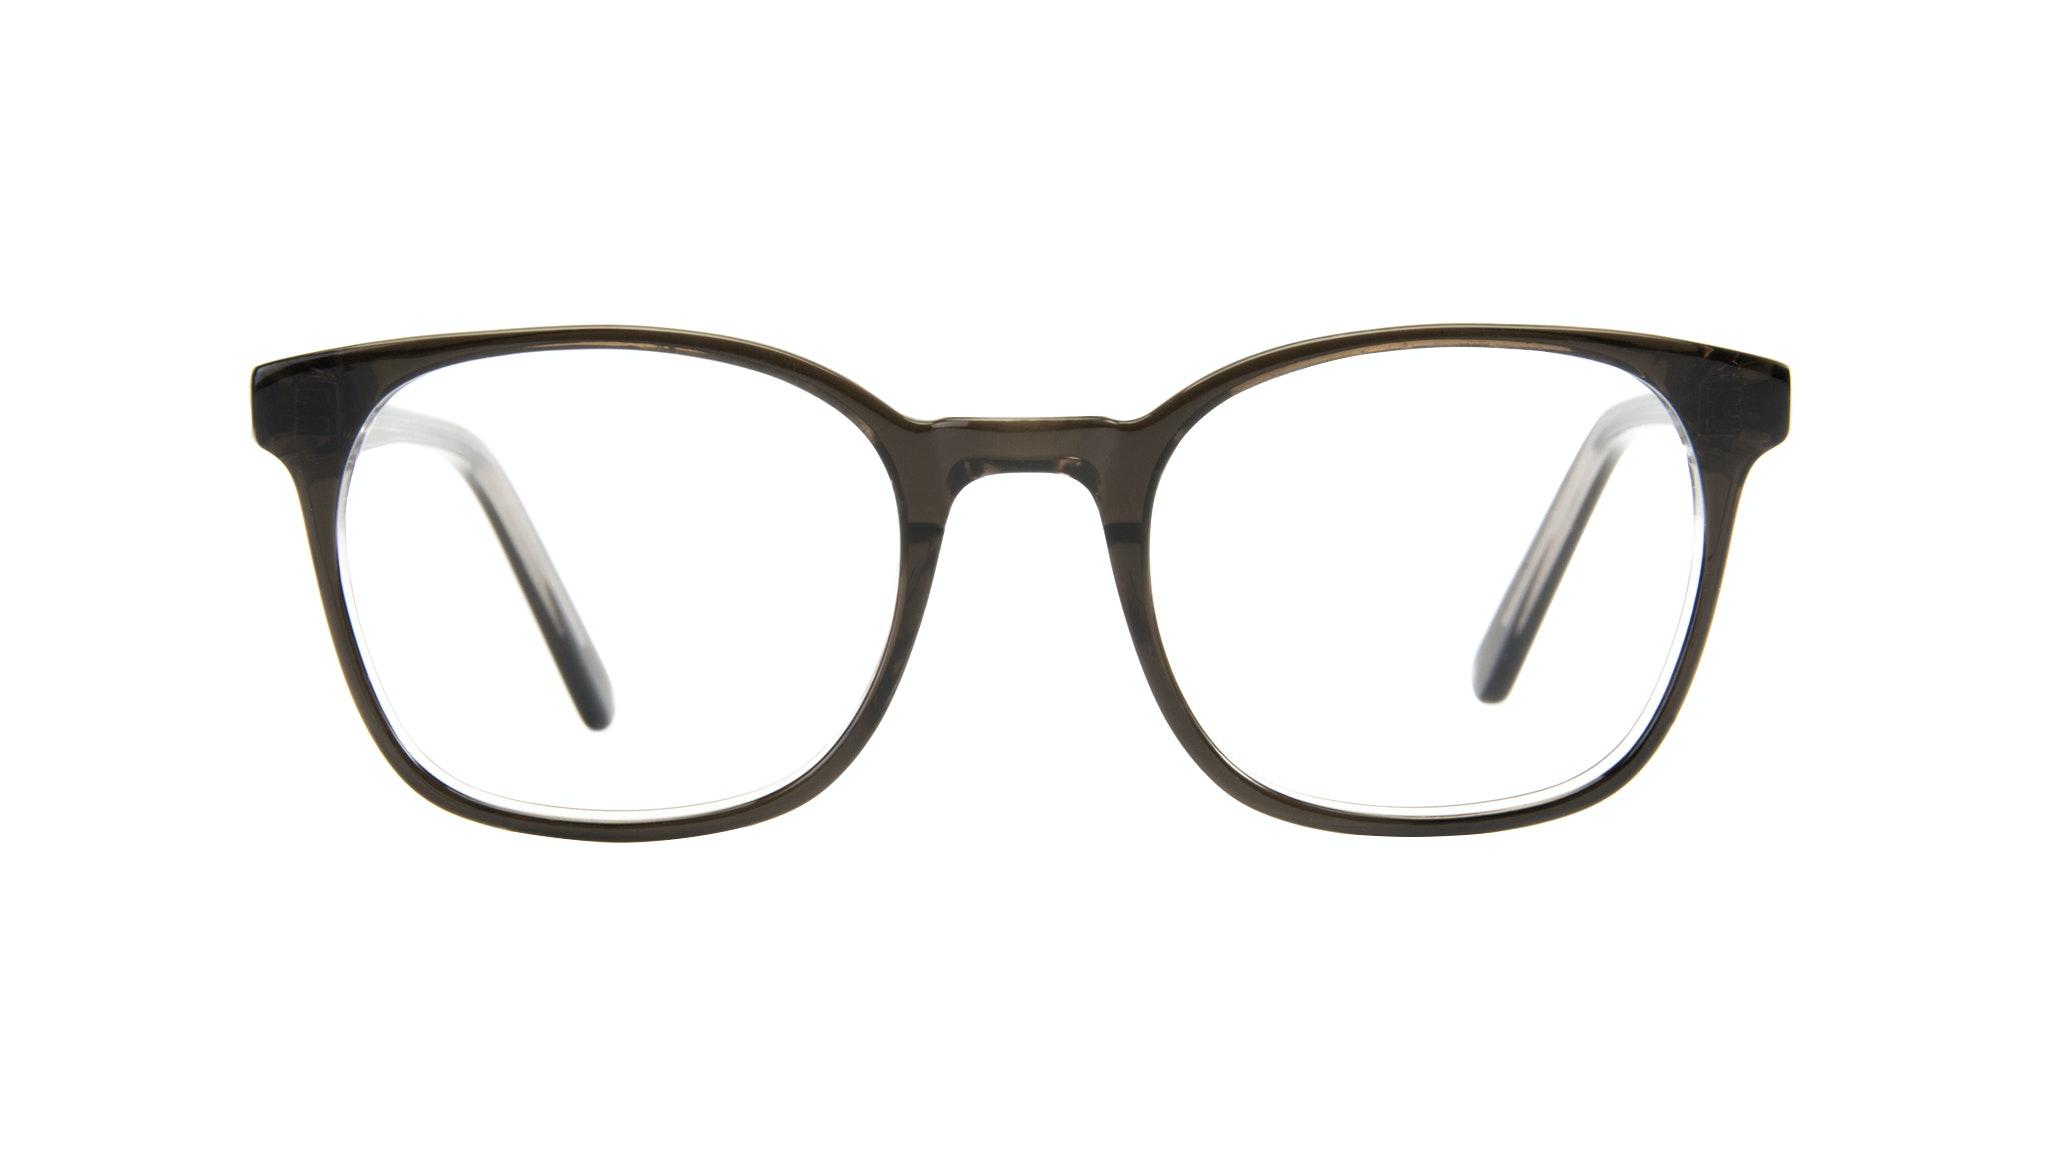 Affordable Fashion Glasses Rectangle Square Eyeglasses Men Peak Black Ice Front